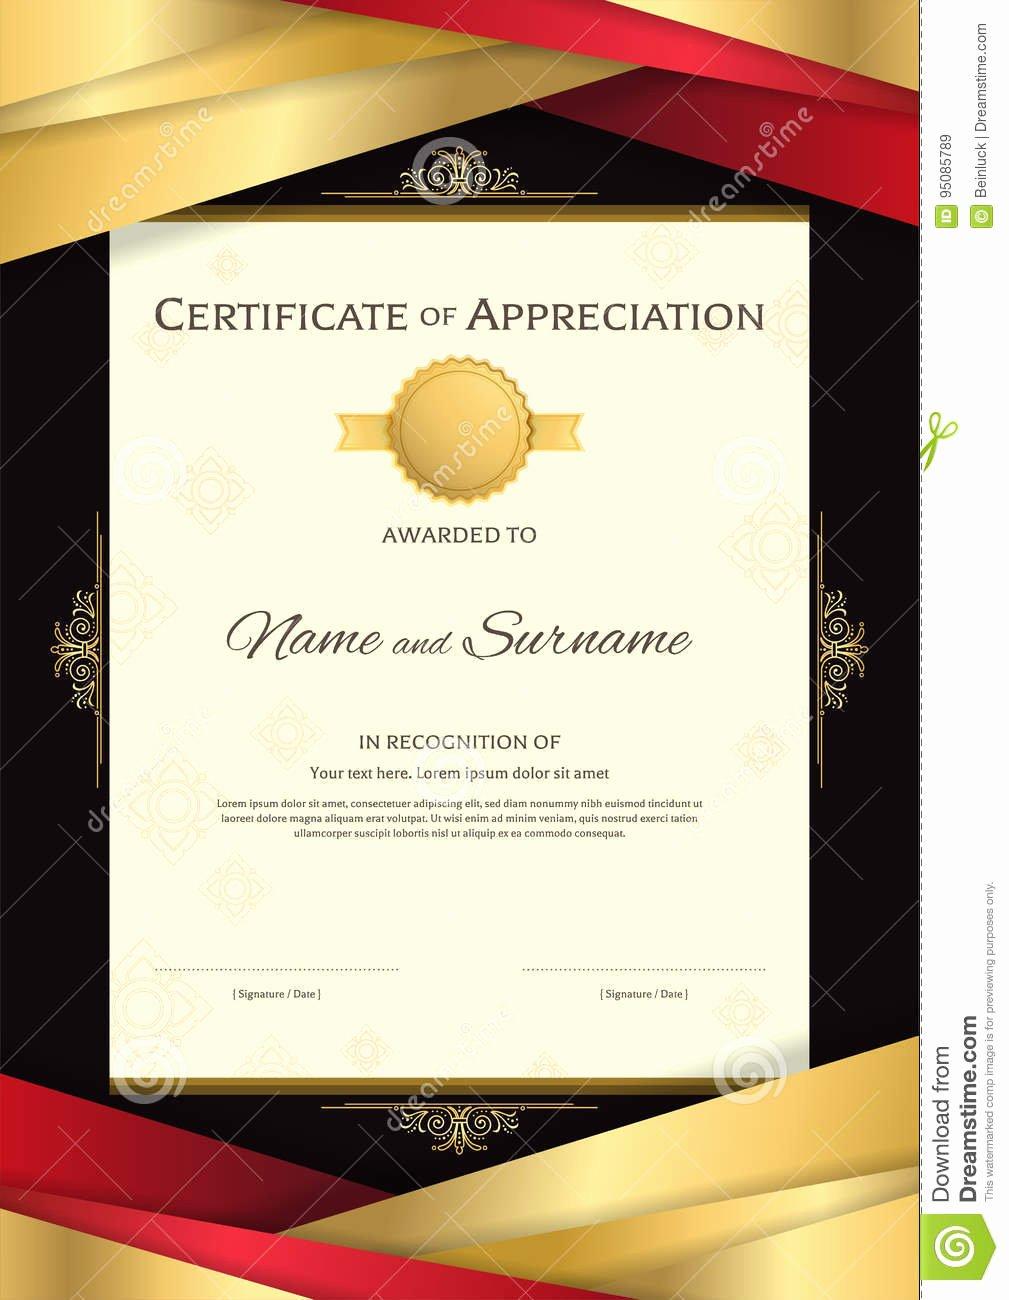 Graduation Certificate Of Appreciation Best Of Portrait Luxury Certificate Template with Elegant Golden